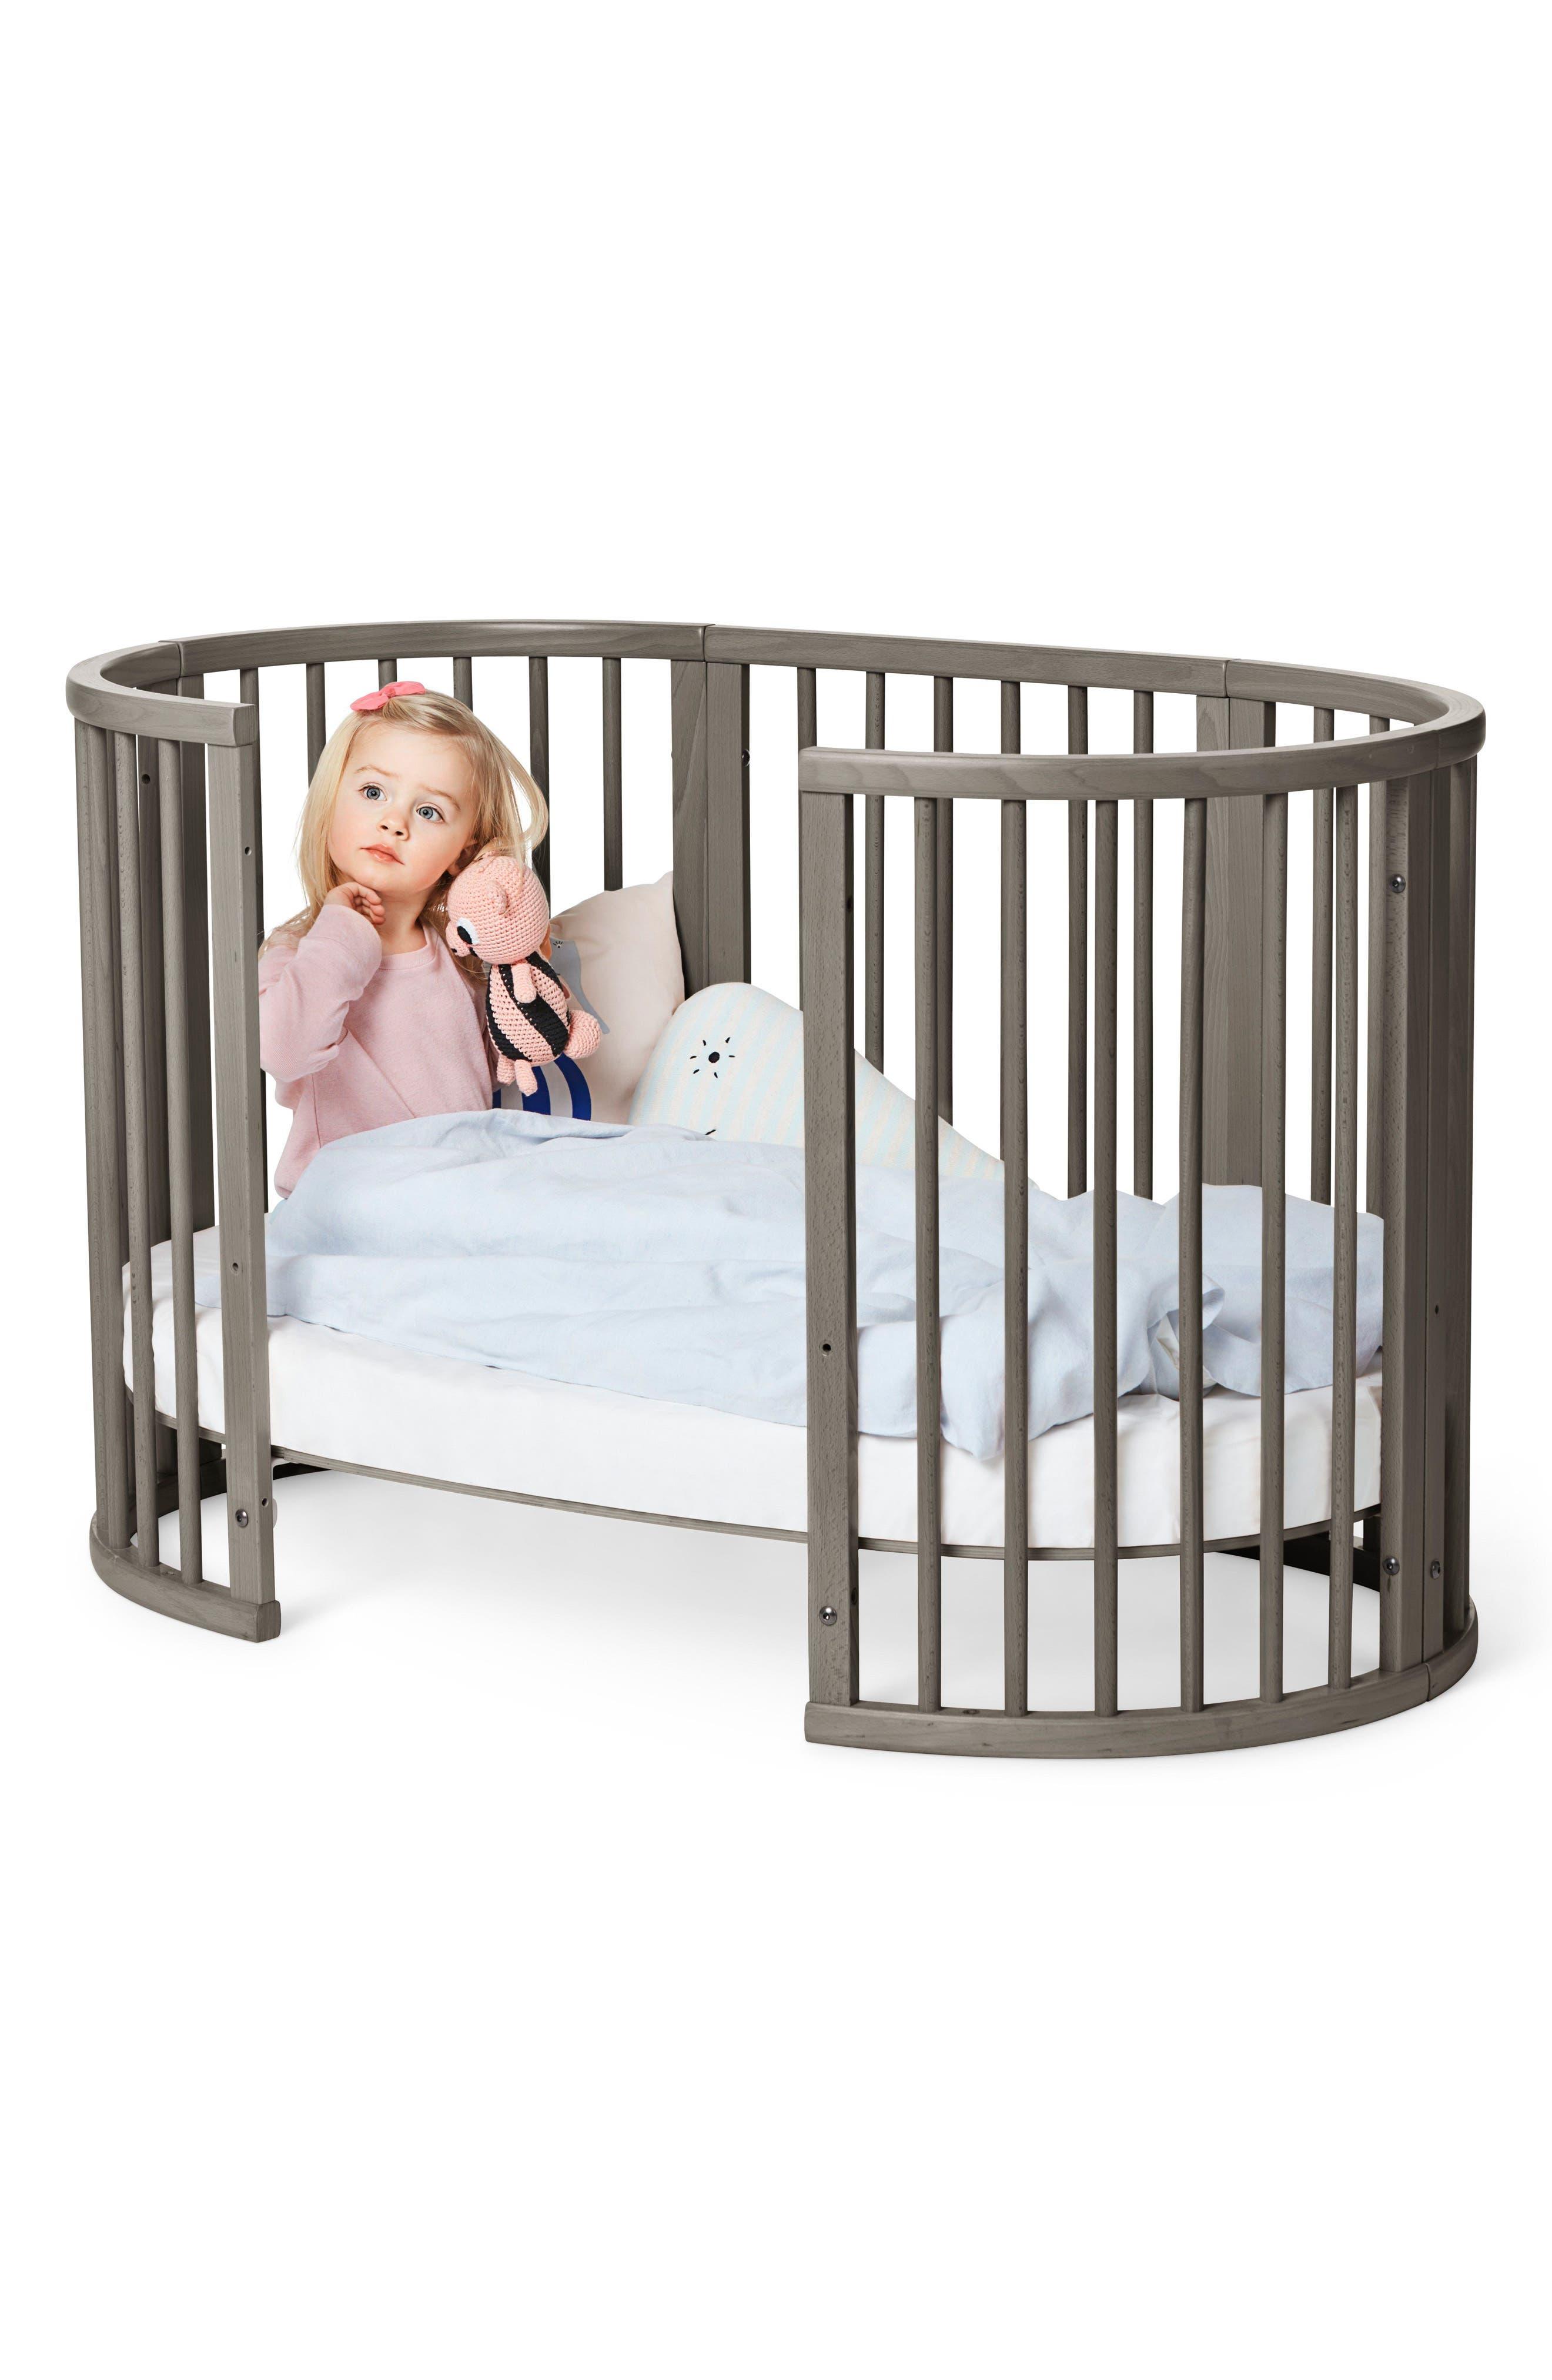 Stokke Infant Stokke Convertible Sleepi Crib & Toddler Bed, Size One Size - Grey